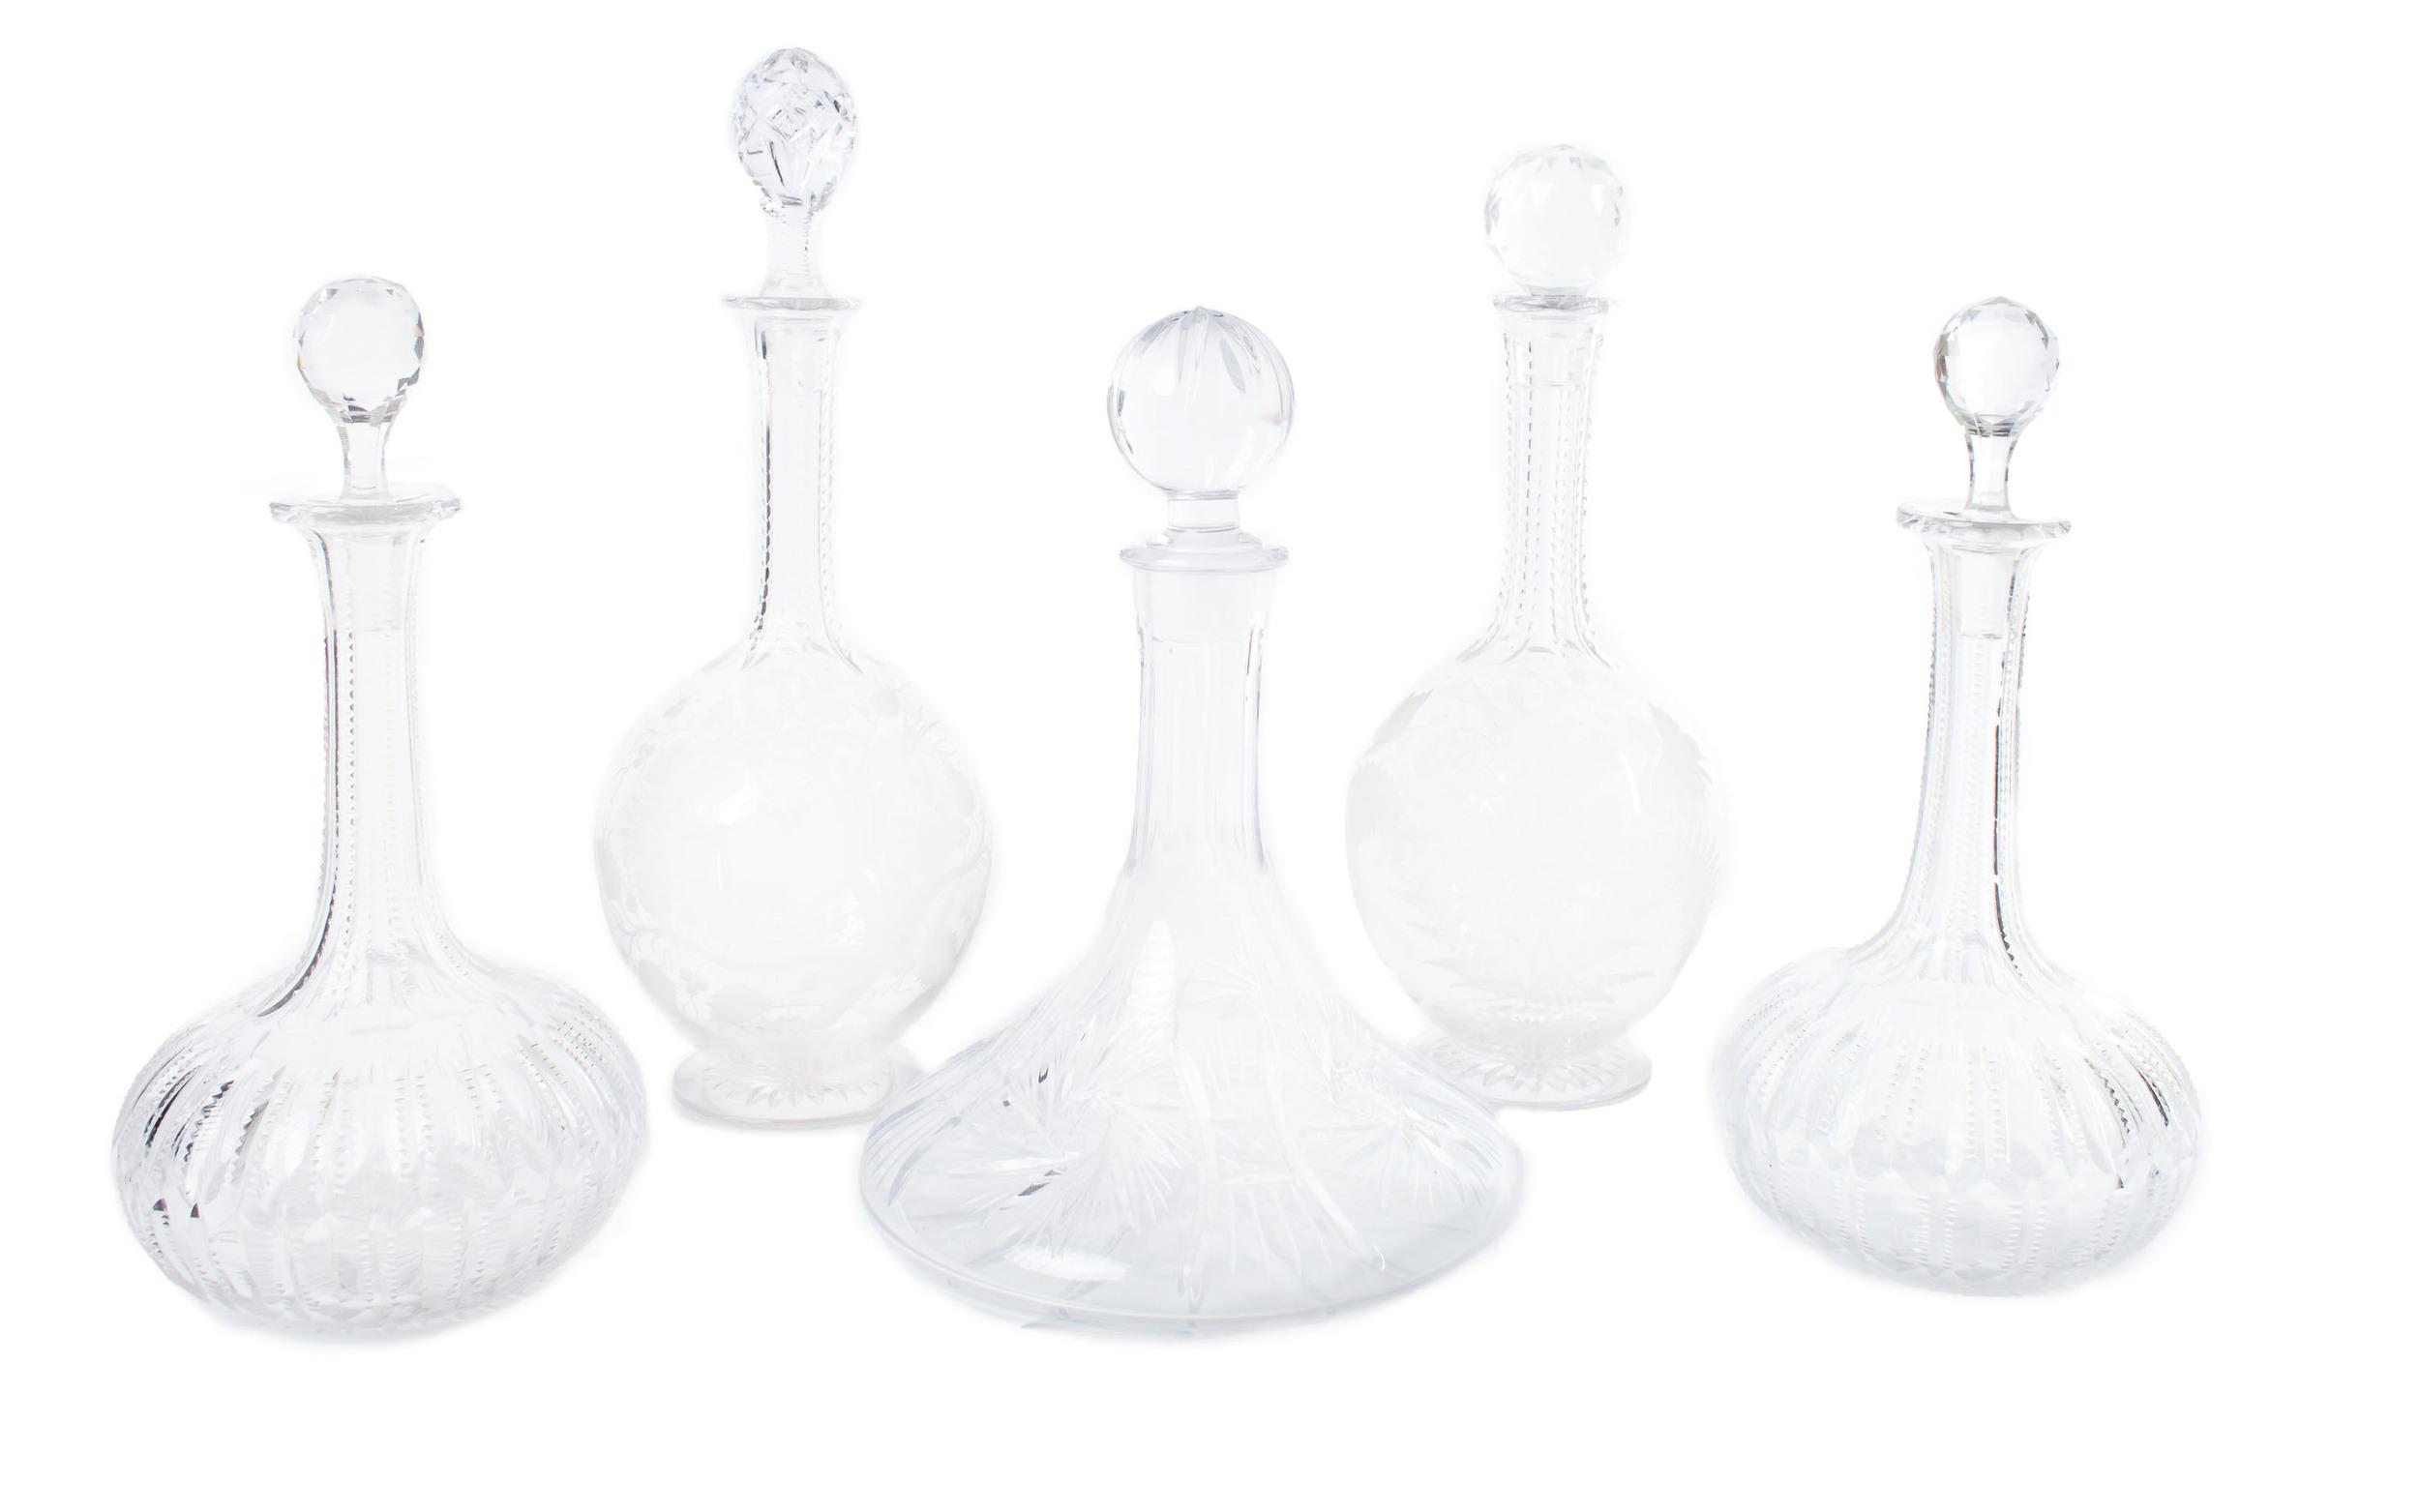 Crystal liquor decanters